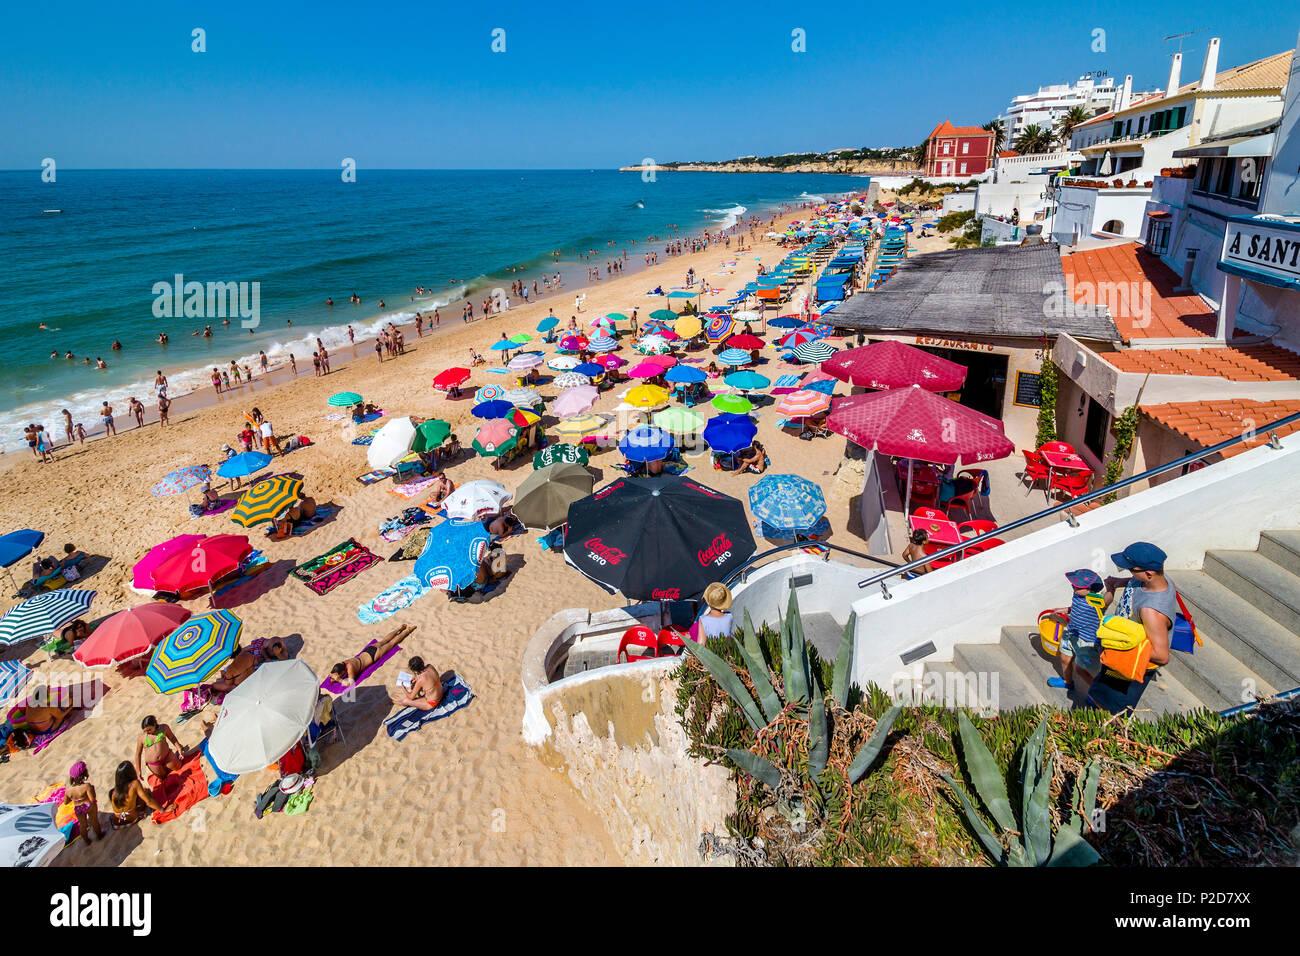 Beach life, beach at Armacao de Pera, Algarve, Portugal - Stock Image